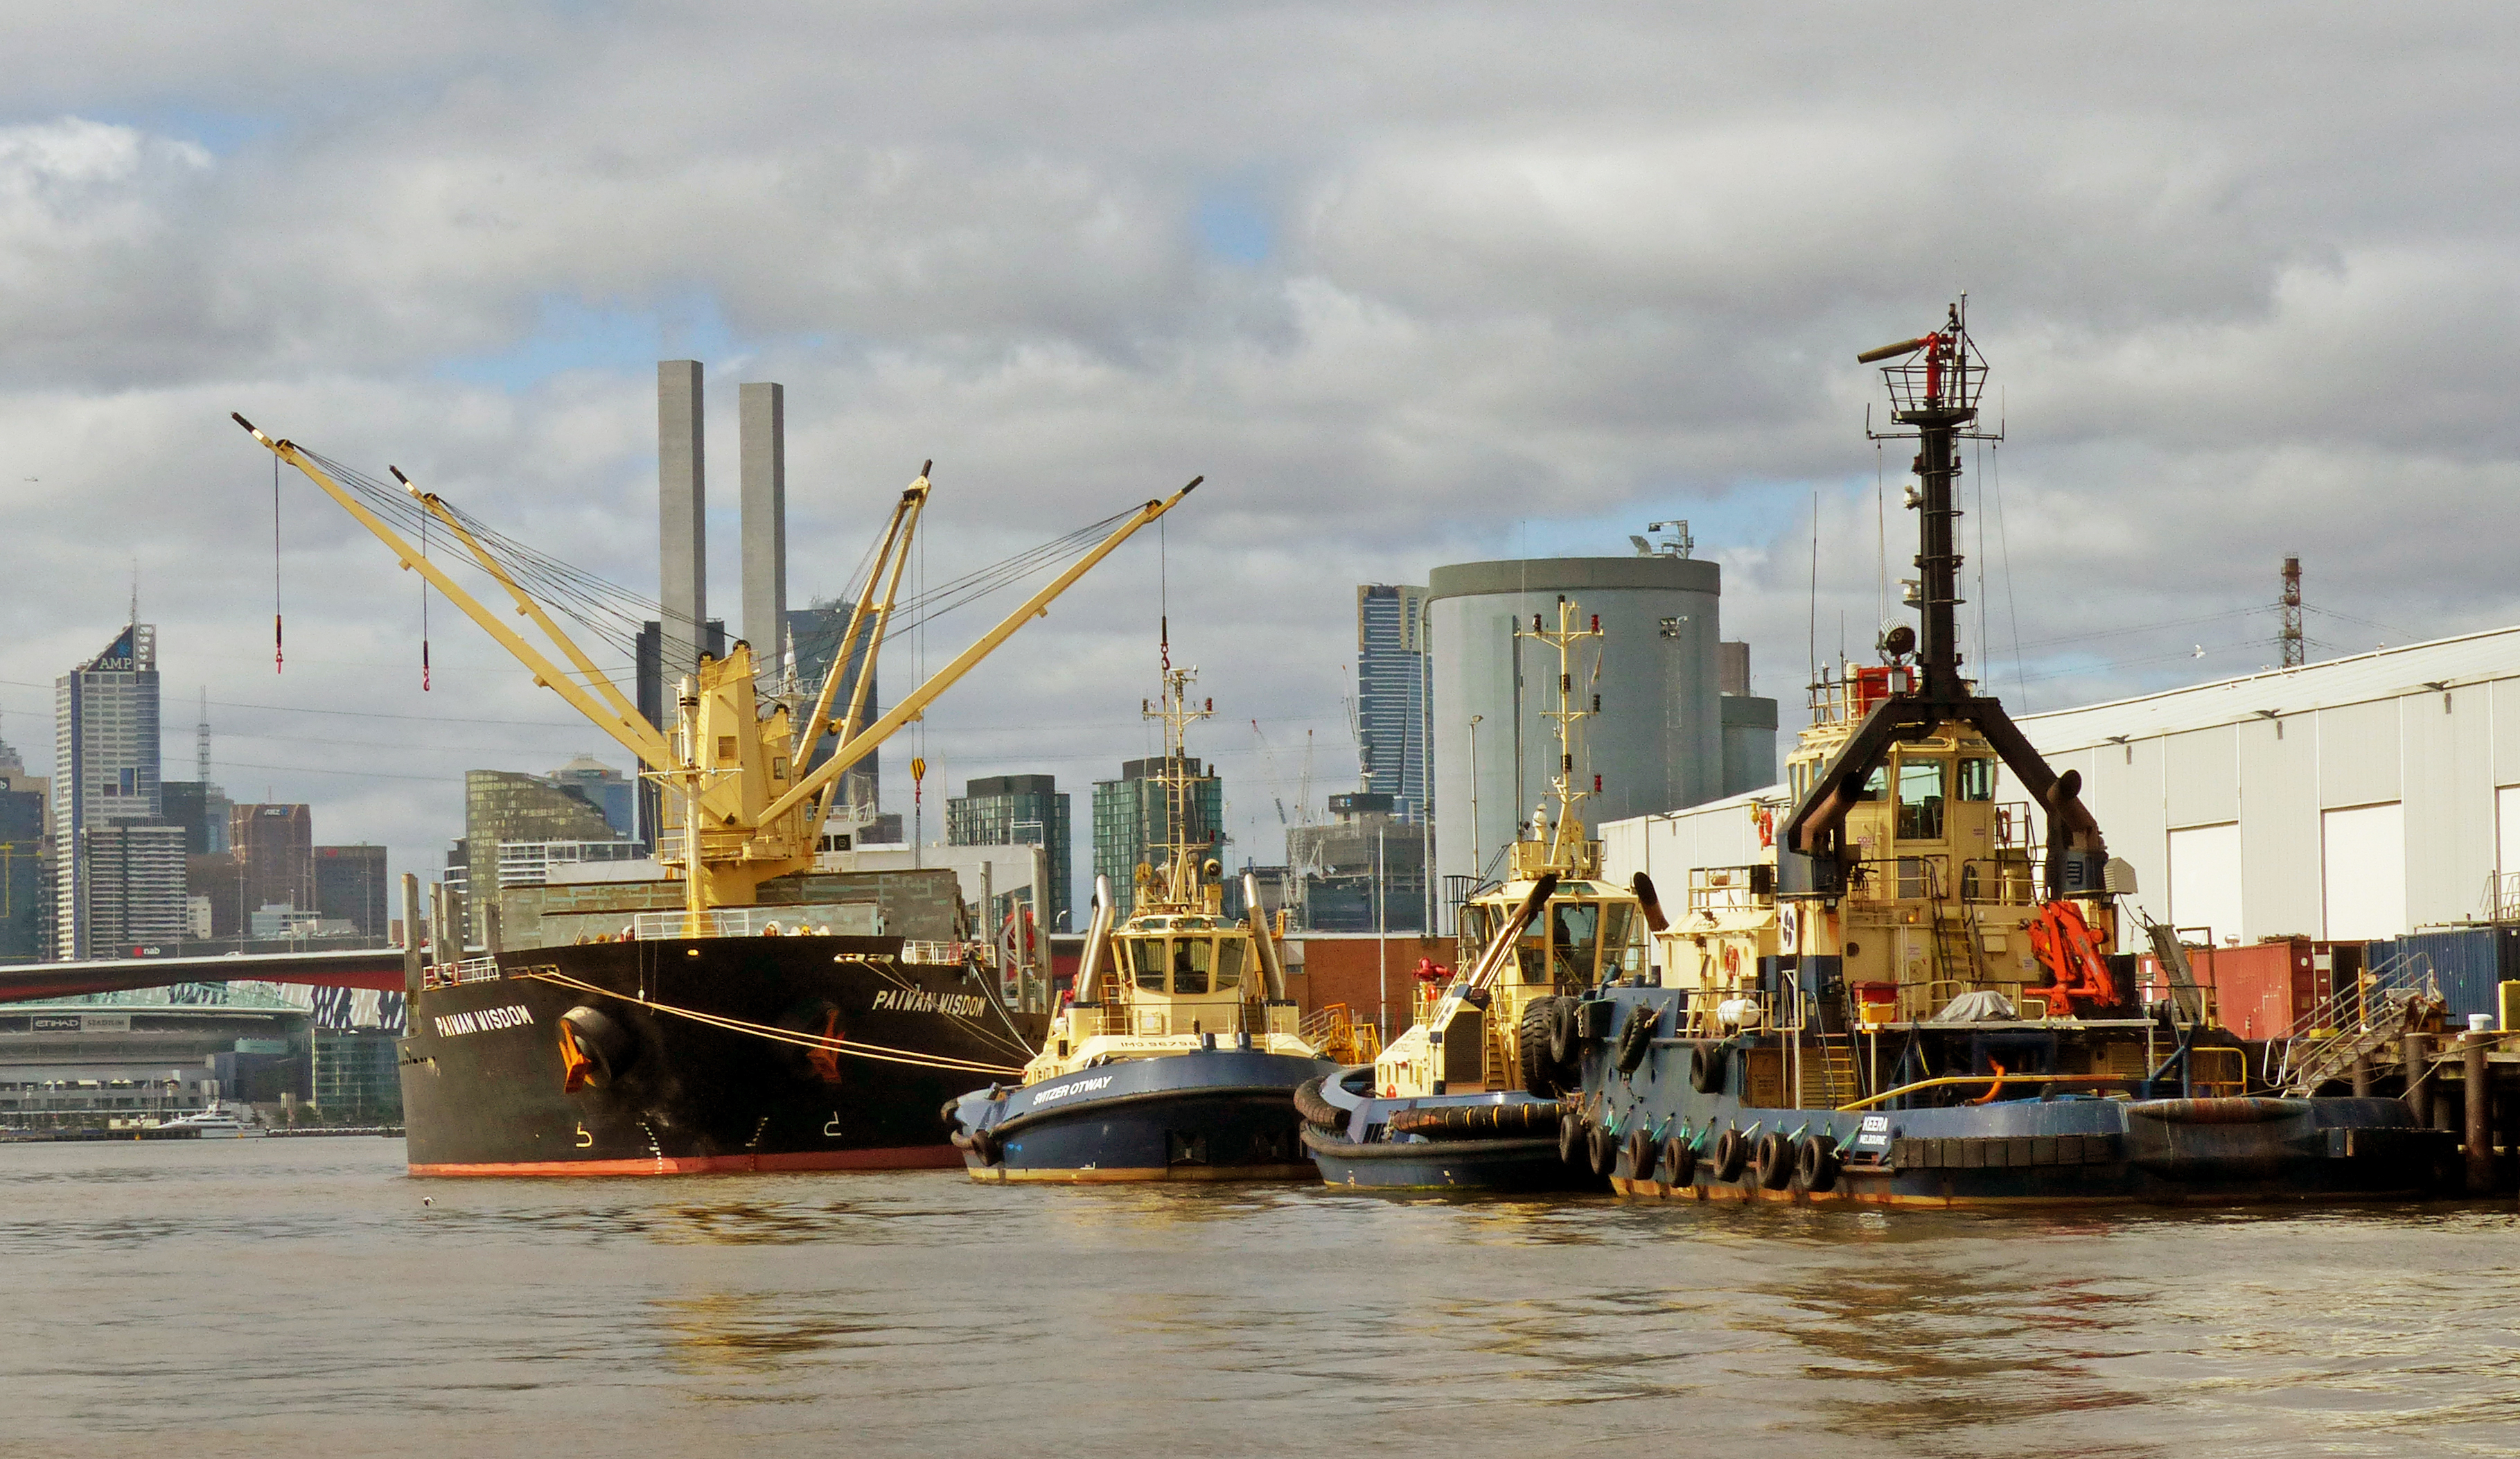 Shipping Port of Melbourne Aust., Boat, Port, Vessel, Tug Boats, HQ Photo